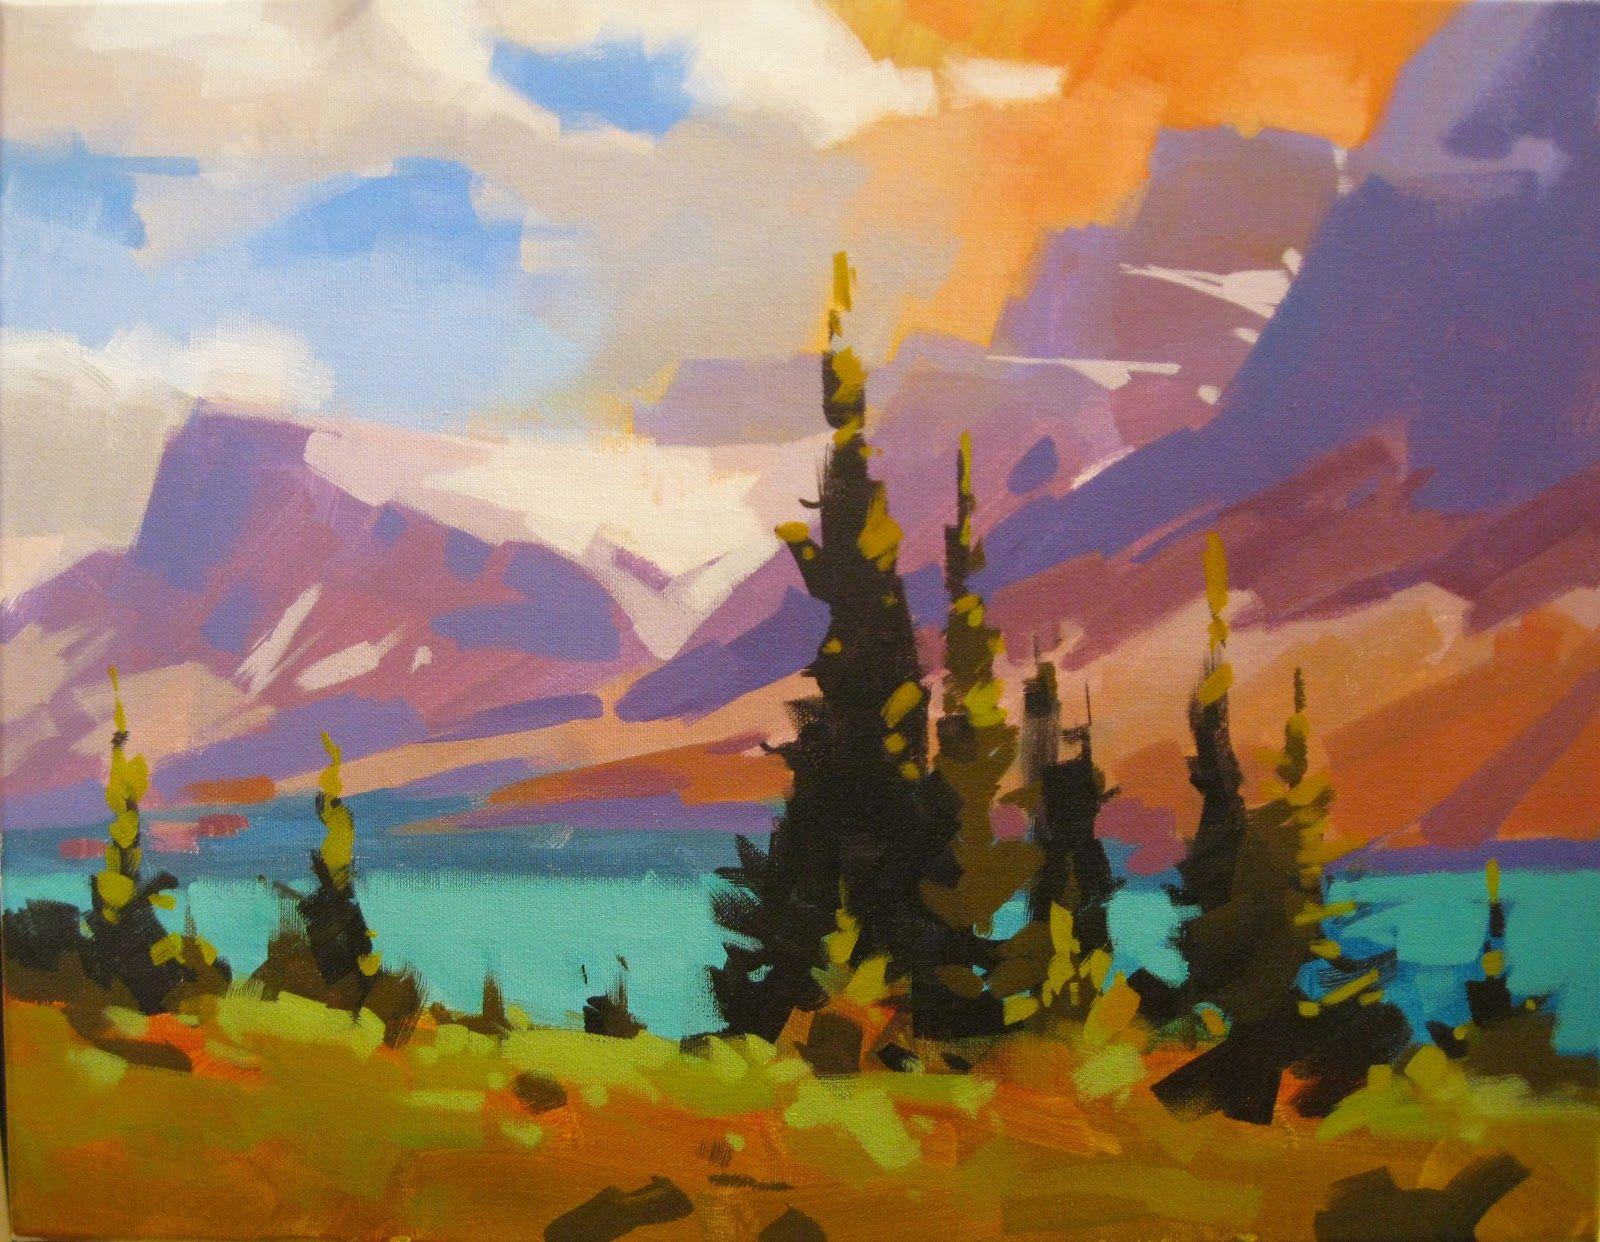 Canada house gallery demos art painting art canadian art